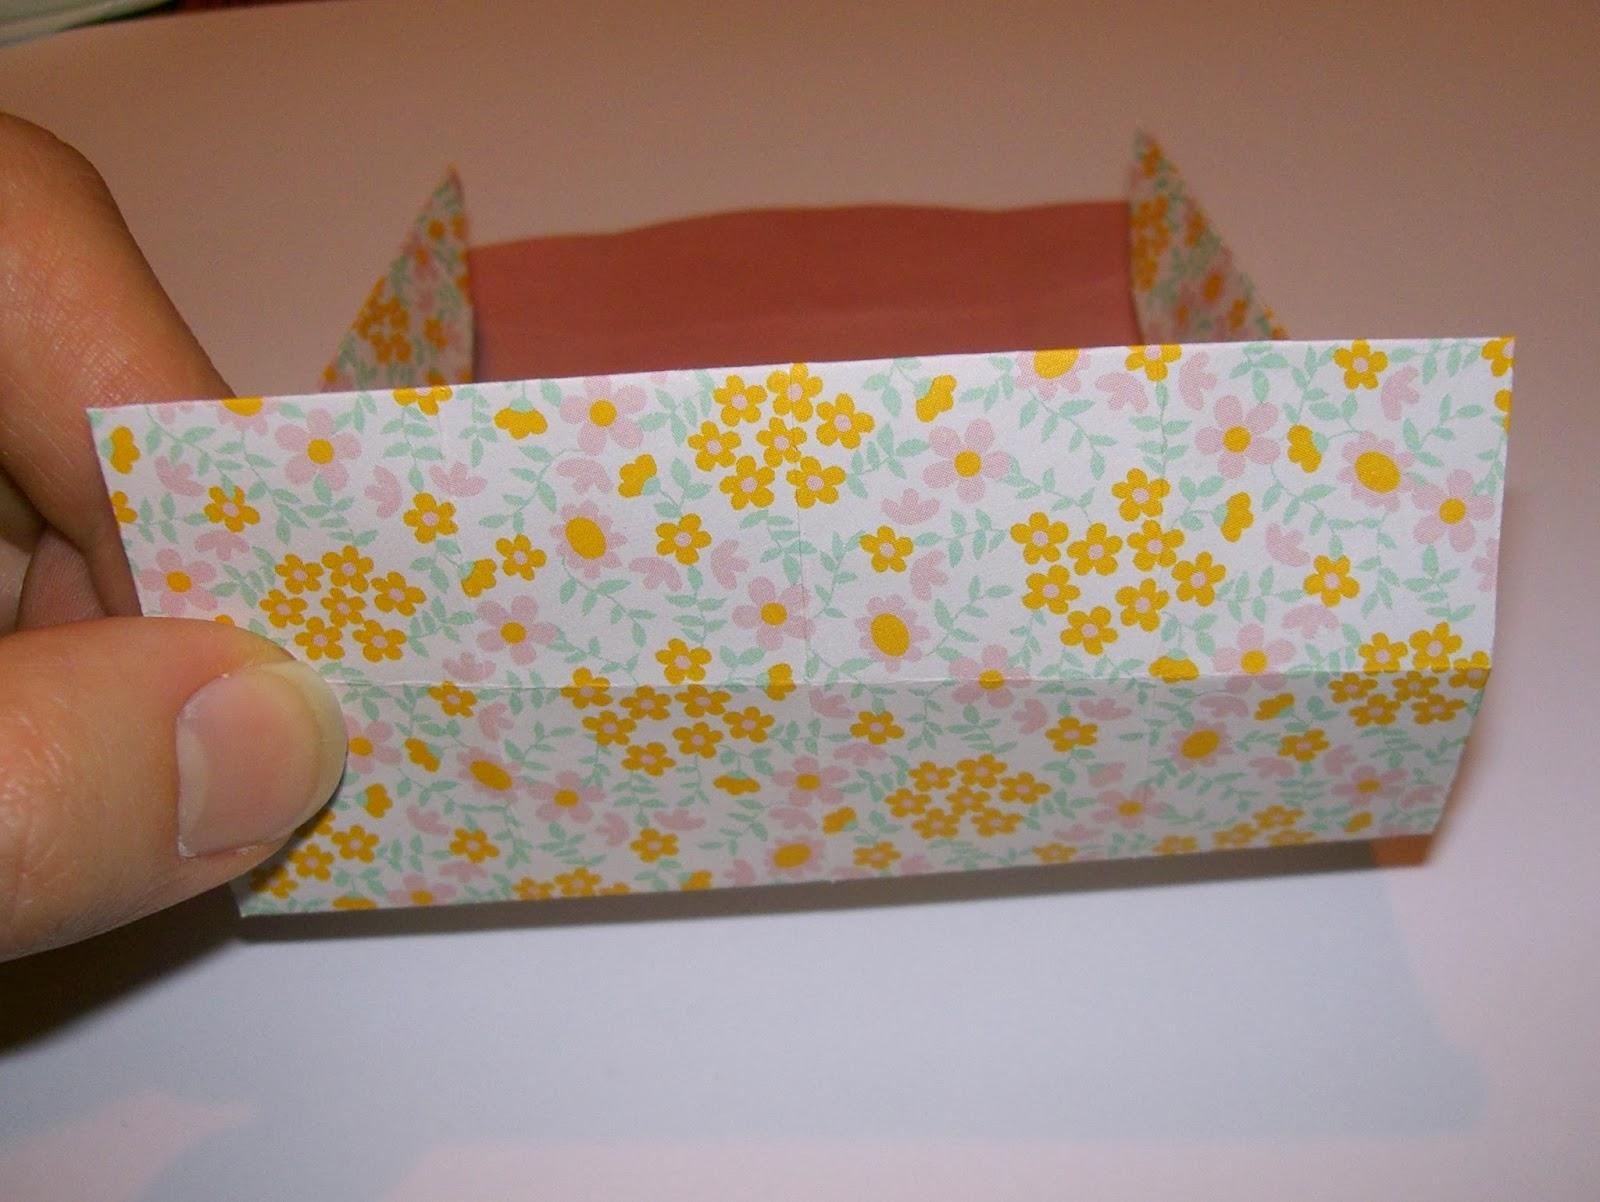 gabulle in wonderland: boîte cadeau en origami